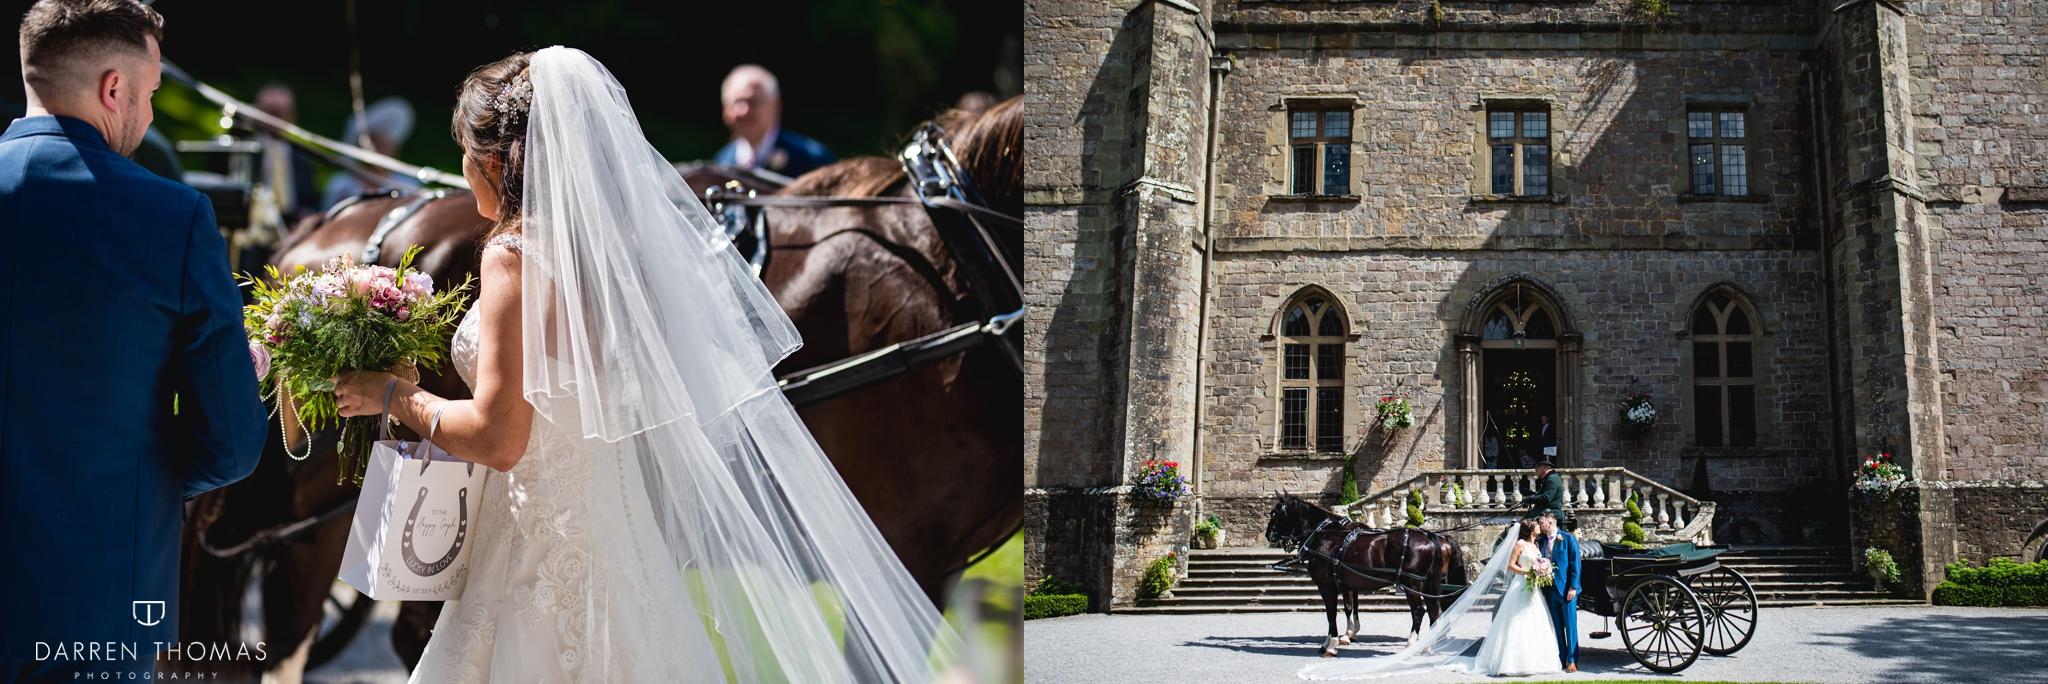 clearwell castle wedding_0016.jpg